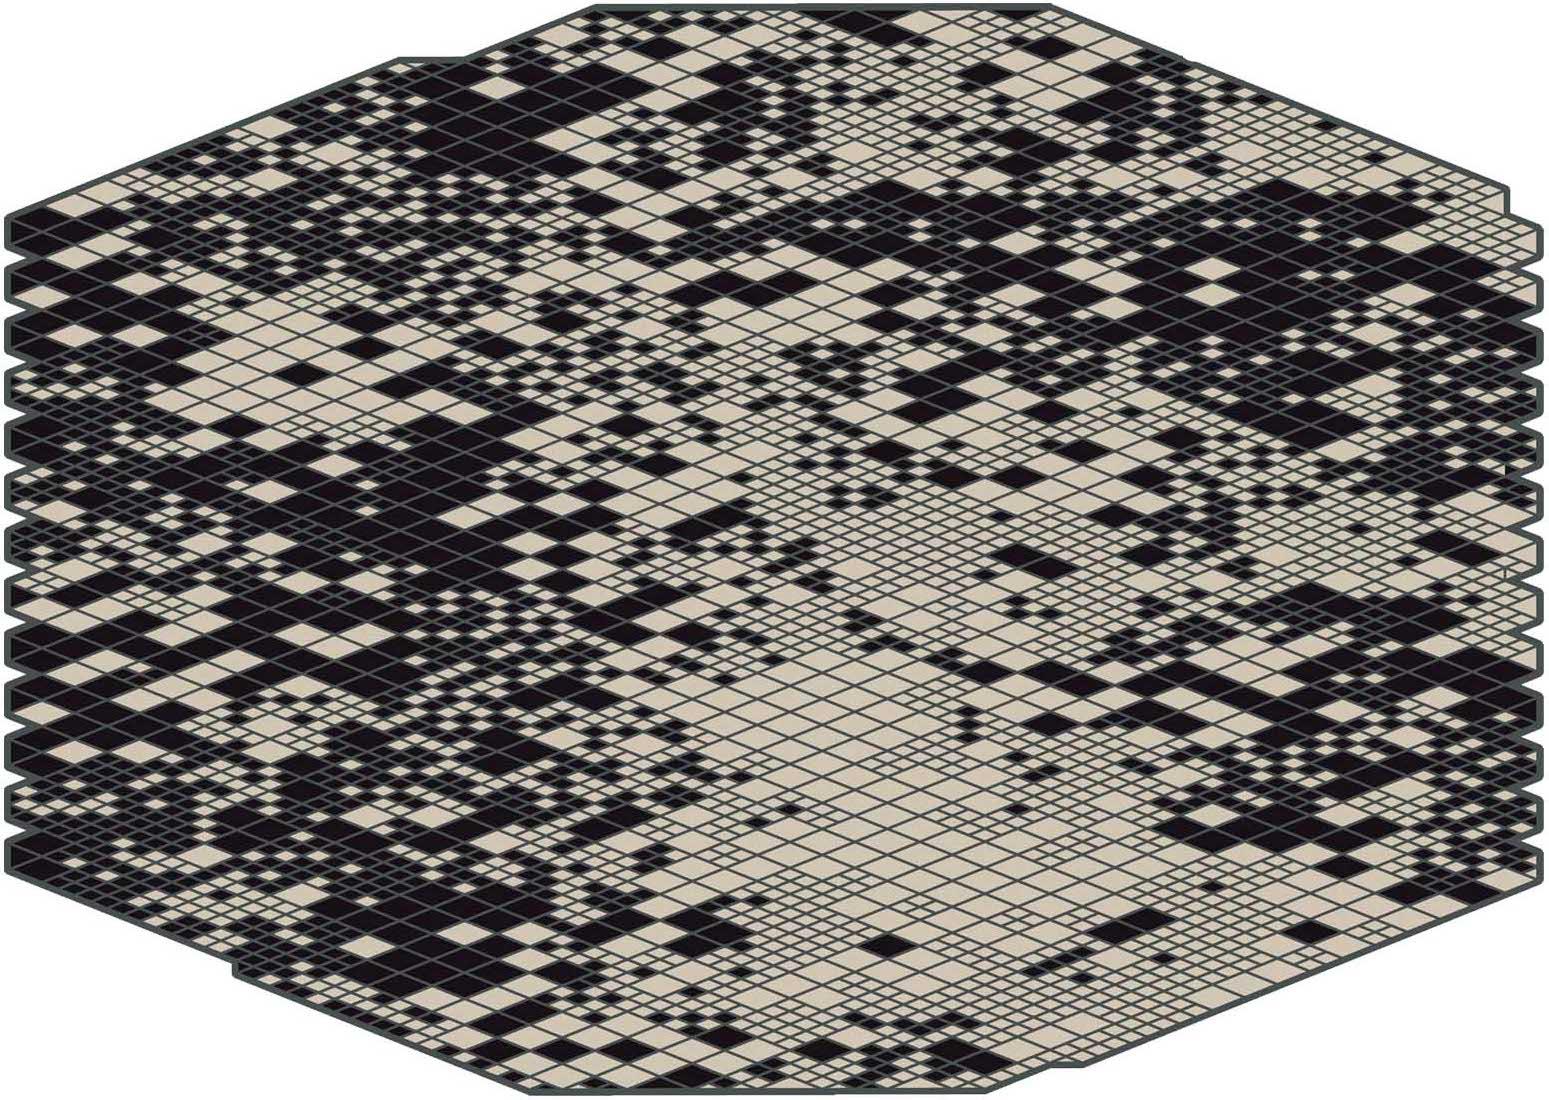 Nanimarquina losanges rugs for Scandic design